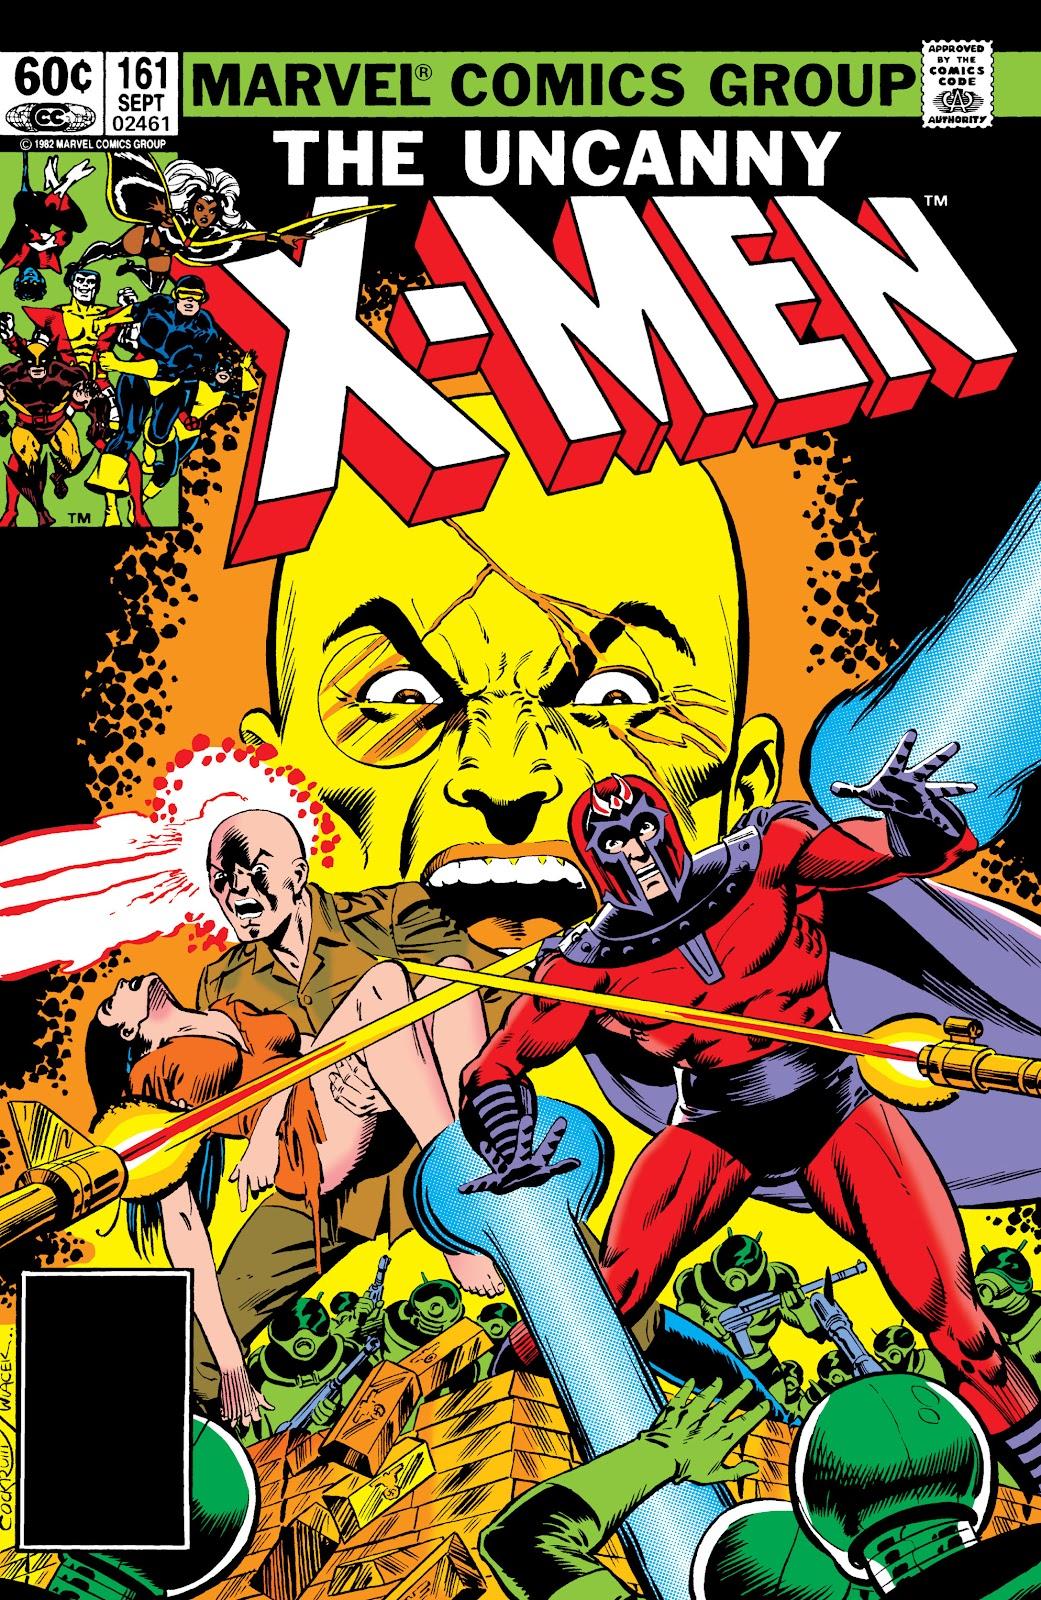 Uncanny X-Men (1963) issue 161 - Page 1